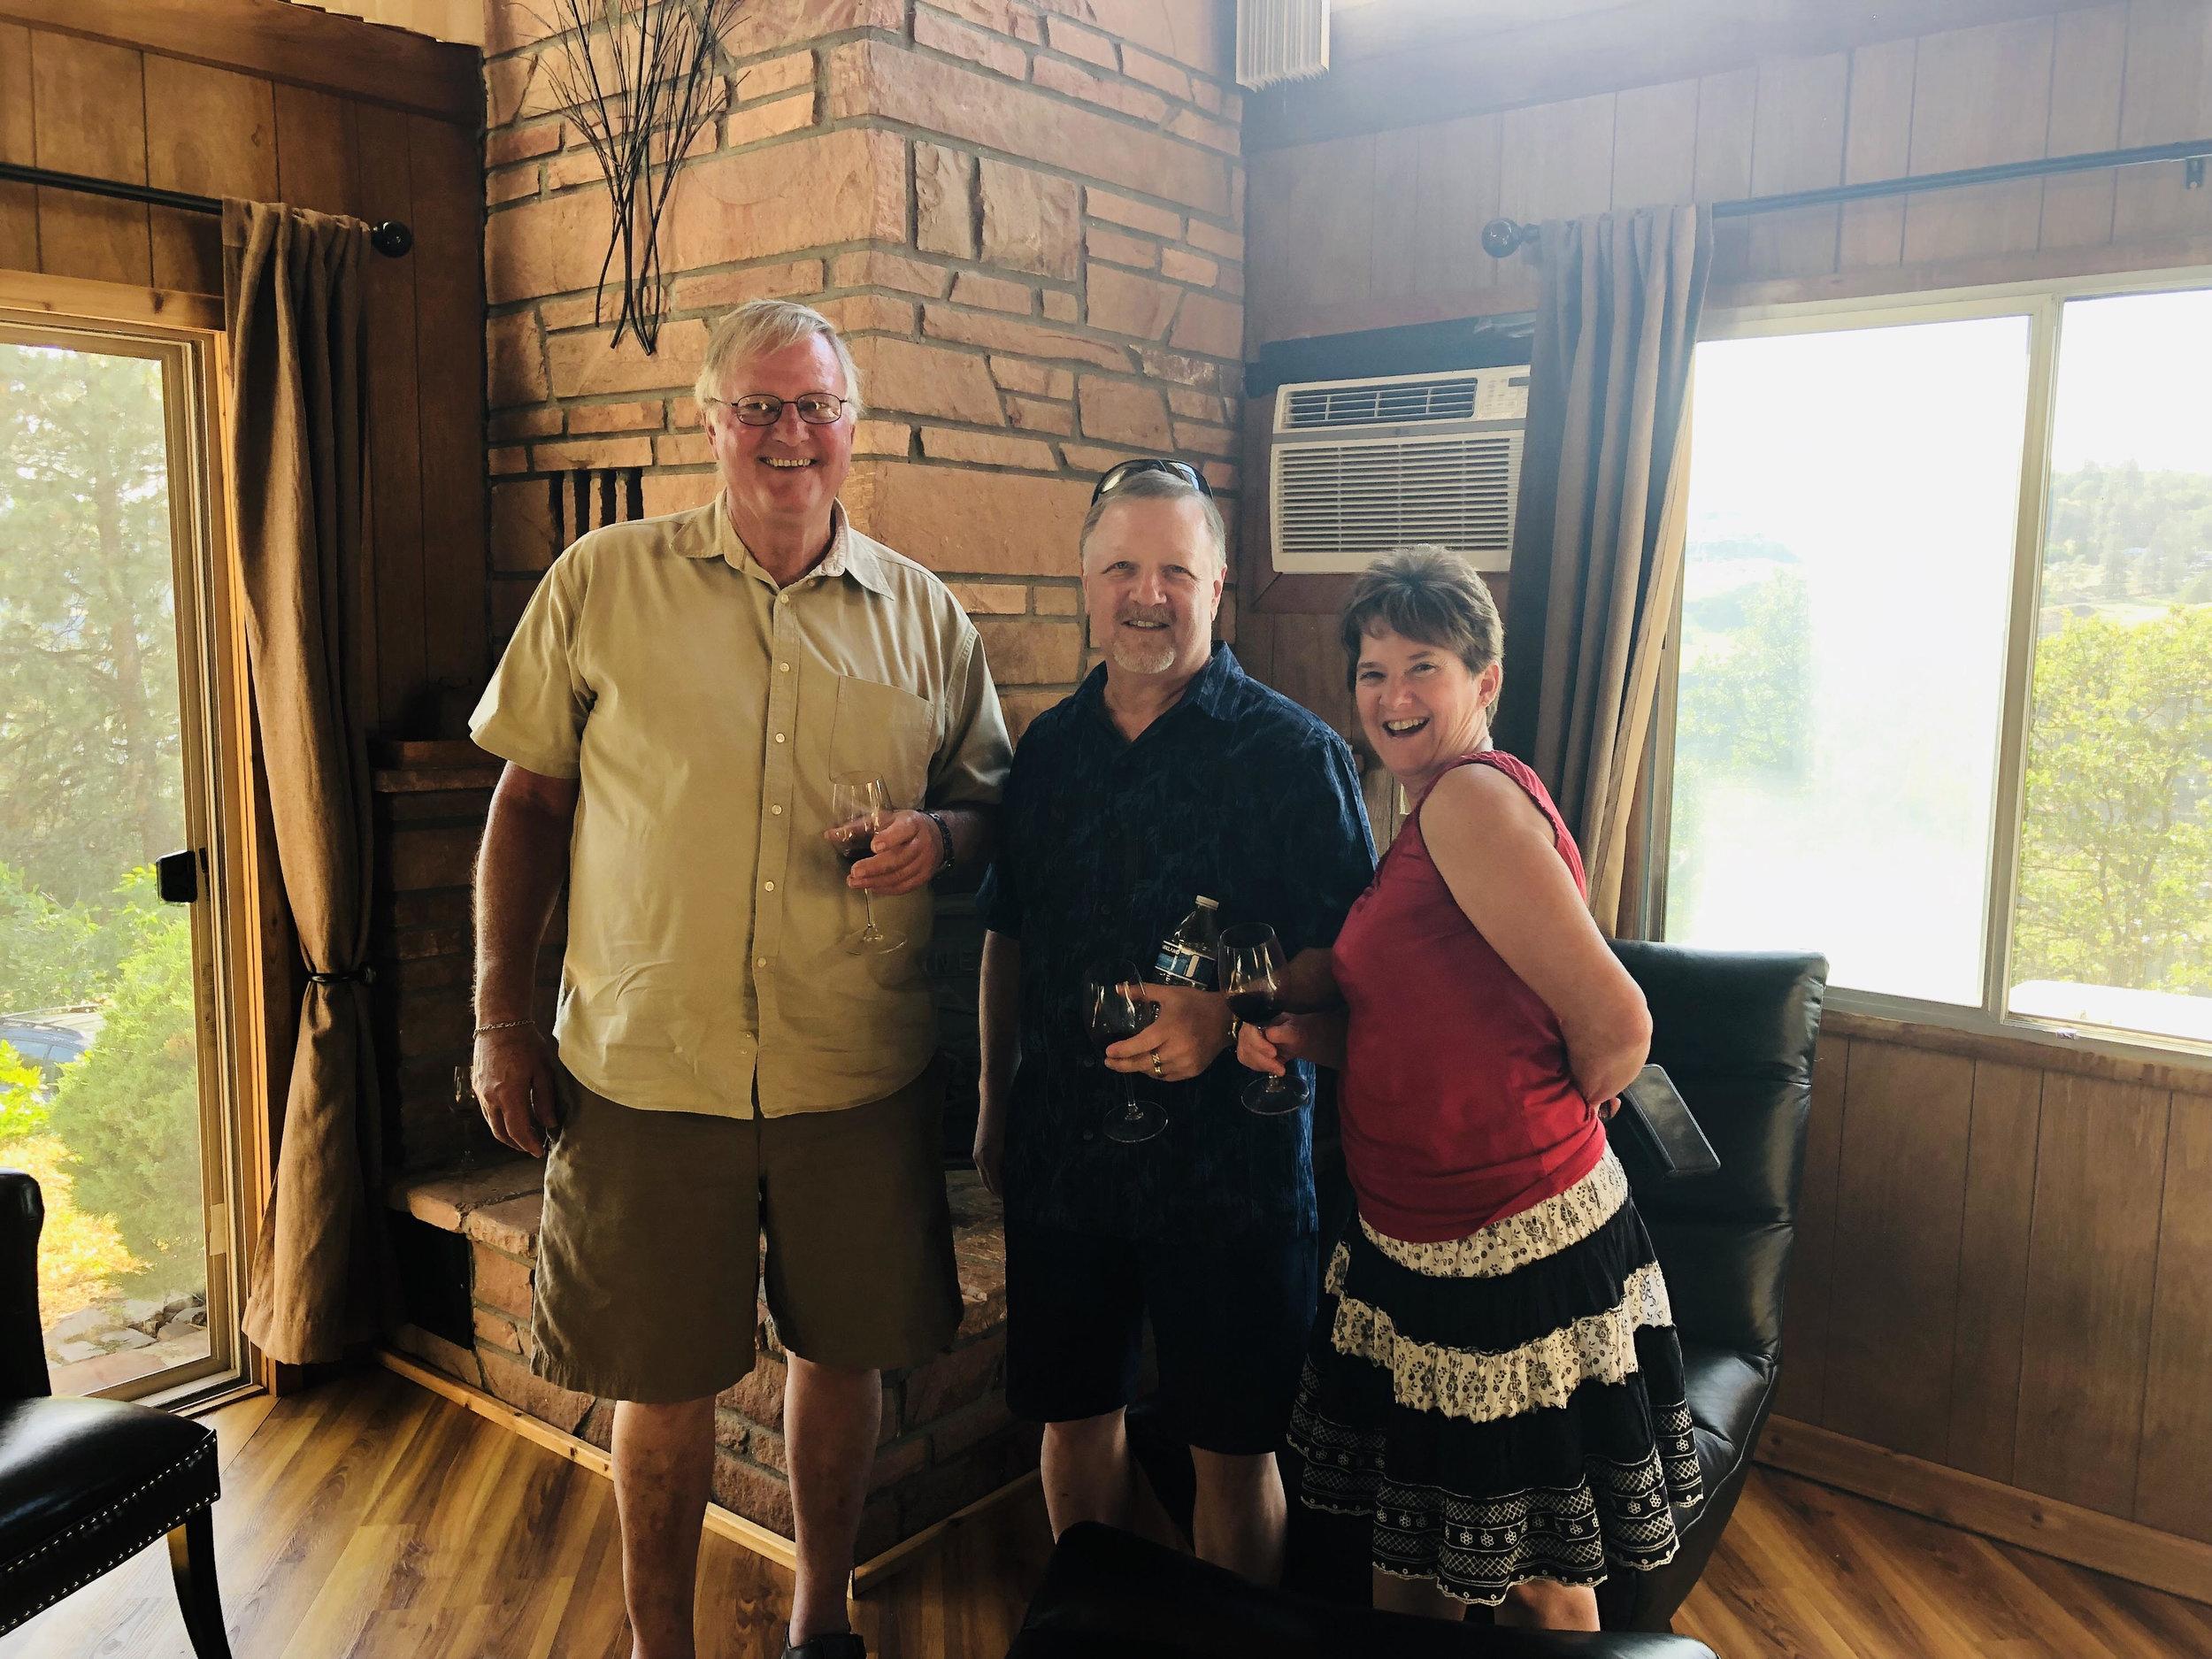 Dad Keith, Gary, and Susan sharing Harley stories and Charbono